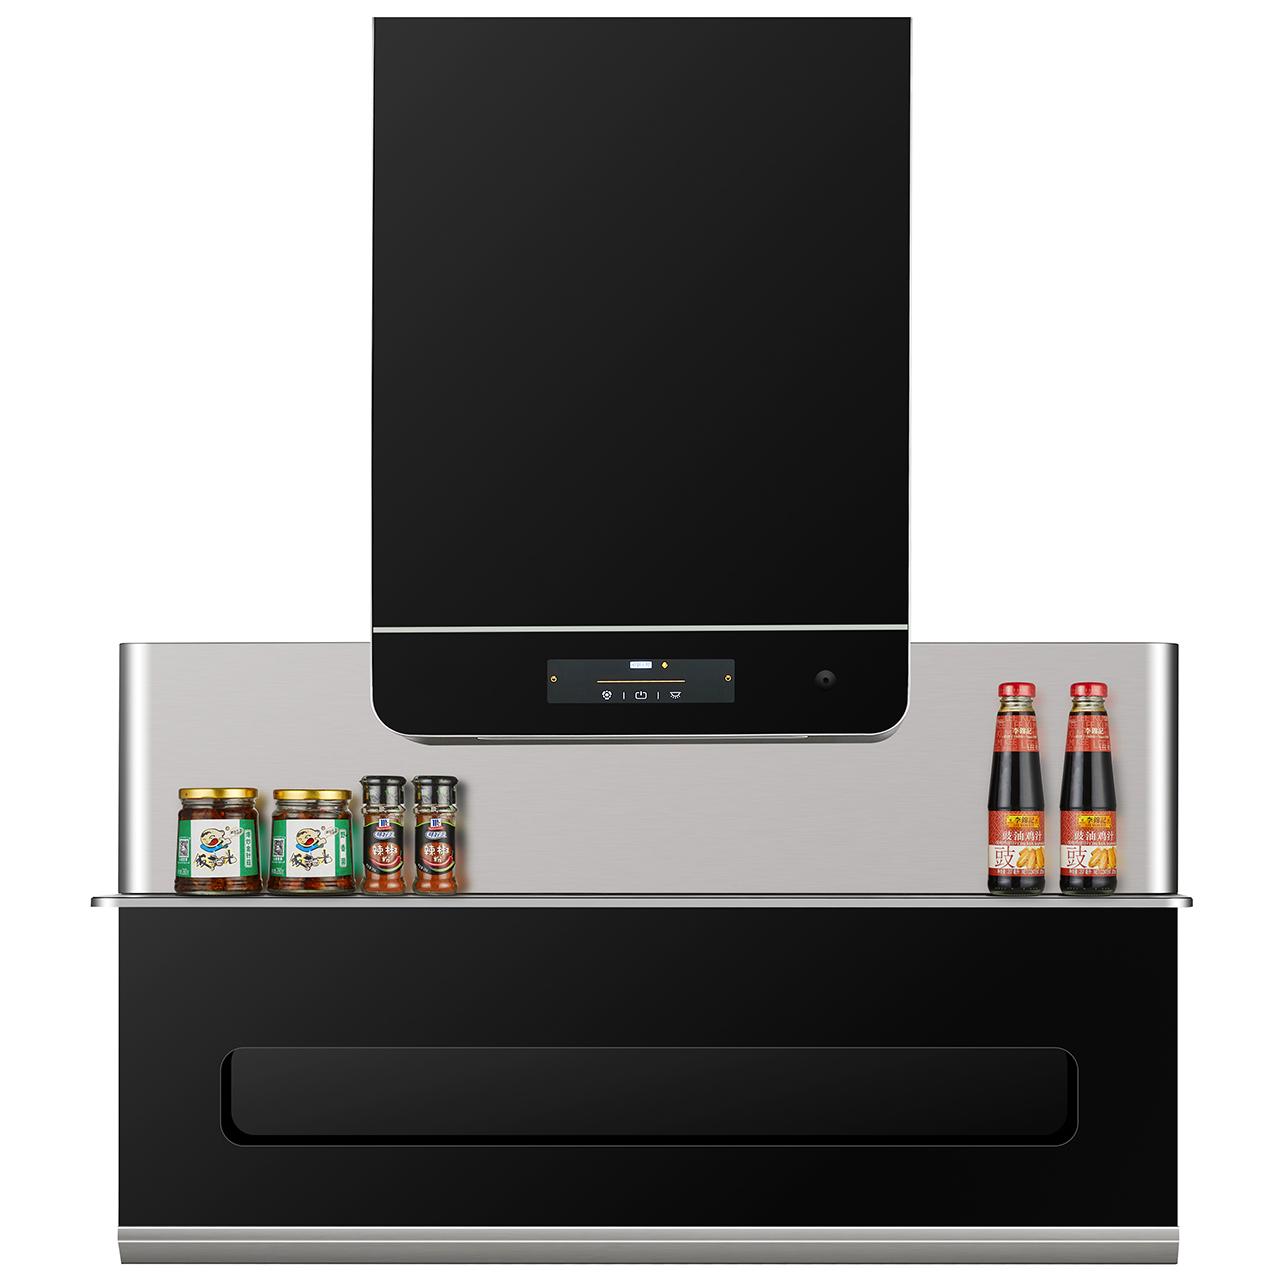 088A2橱柜油烟机,置物式抽油烟机,平板烟机